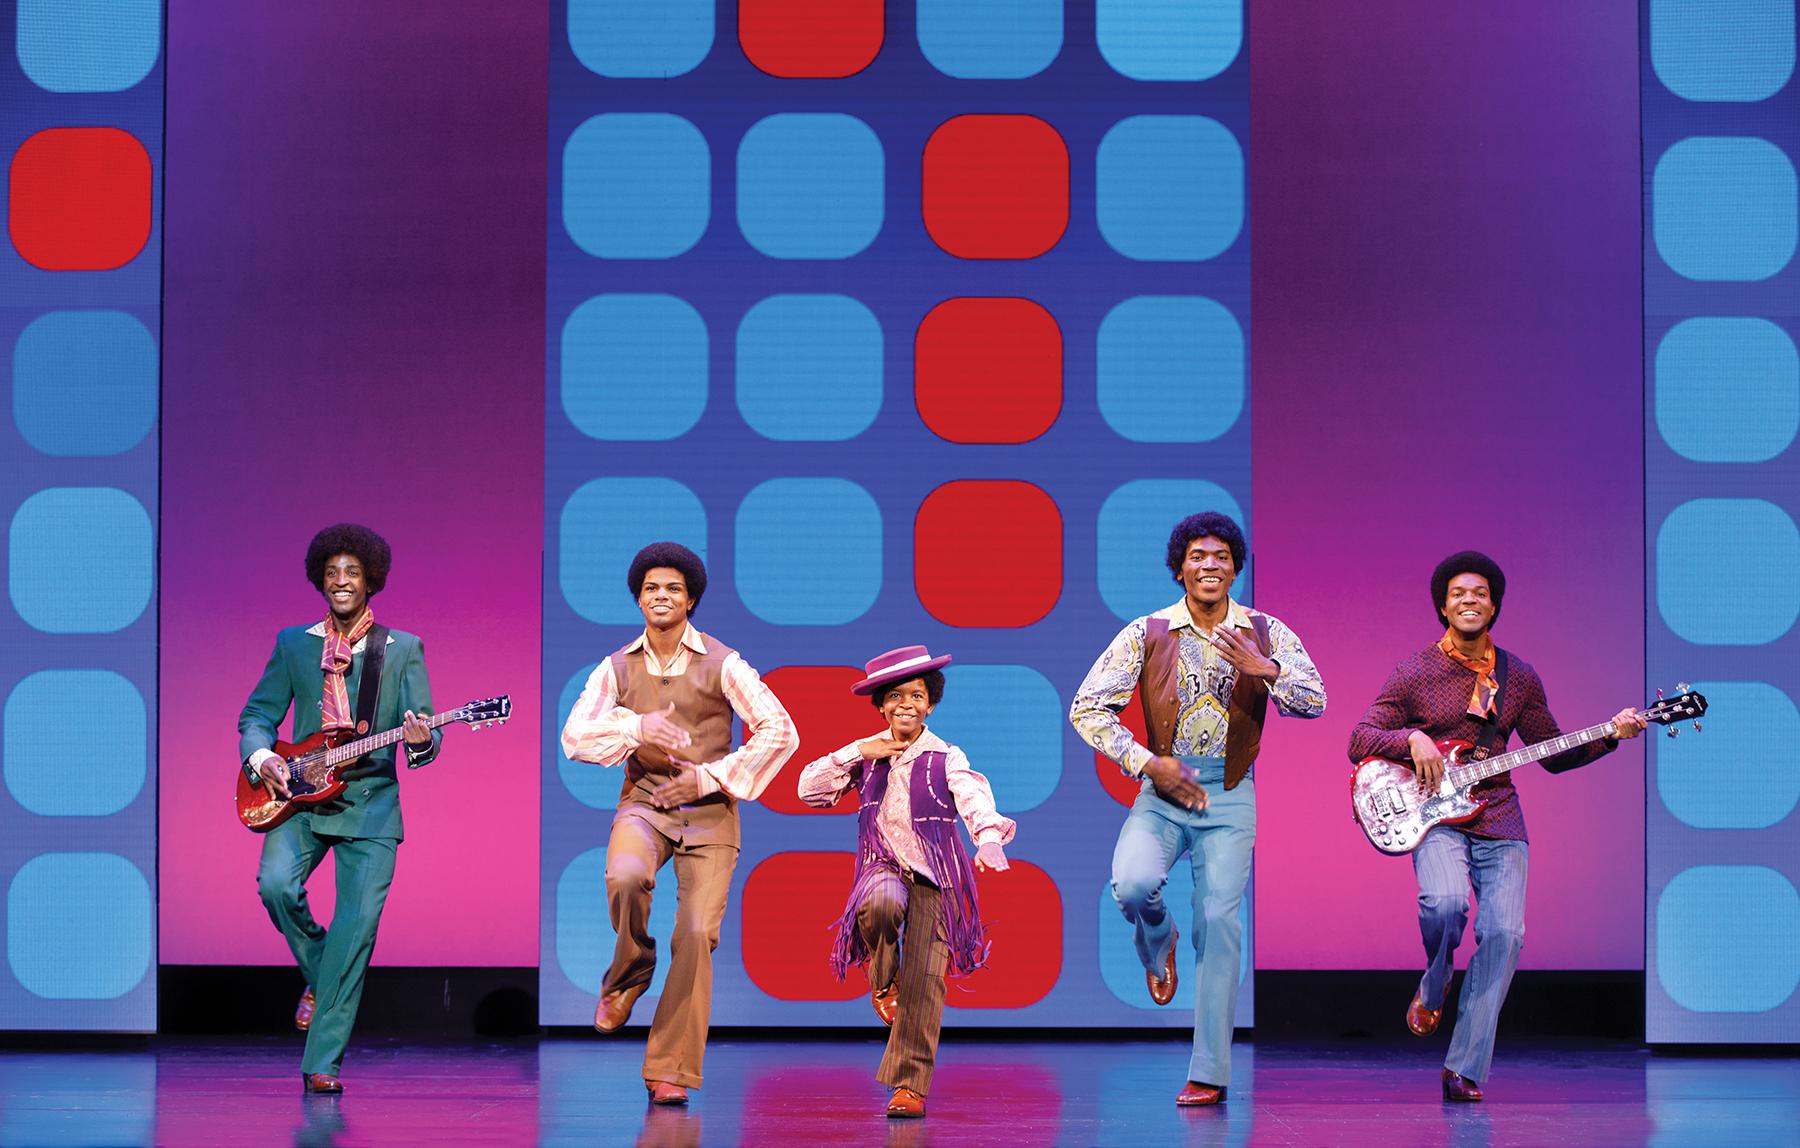 Devin, DeAundre' Woods, Kai Calhoun, Jamari Williams, and Eric Patrick as The Jackson 5 in Motown the Musical.